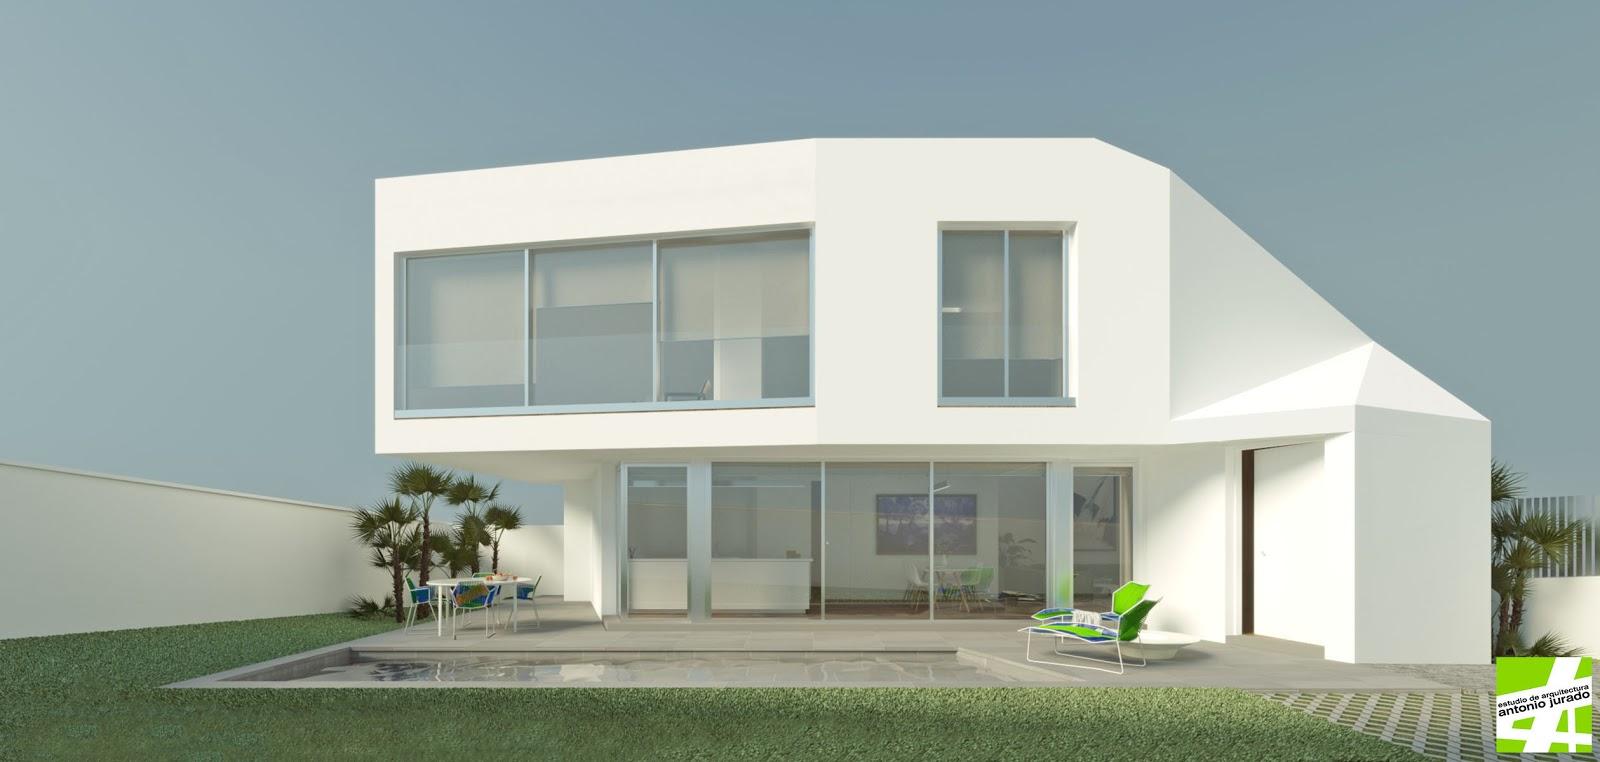 casa-ob-house-alhaurin-malaga-arquitecto-antonio-jurado-01